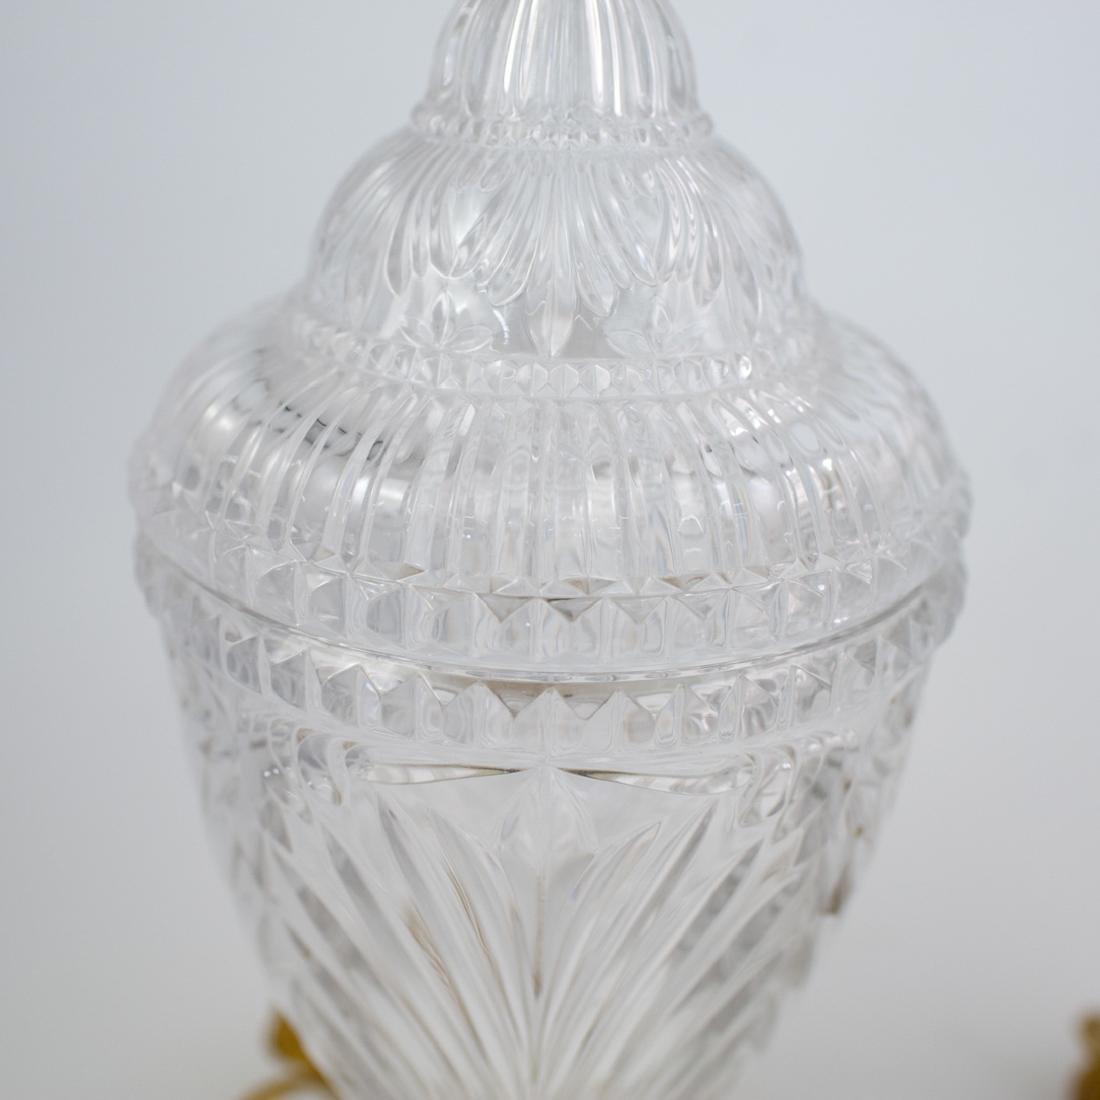 Pair of Cut Crystal Urn Lamps - 2